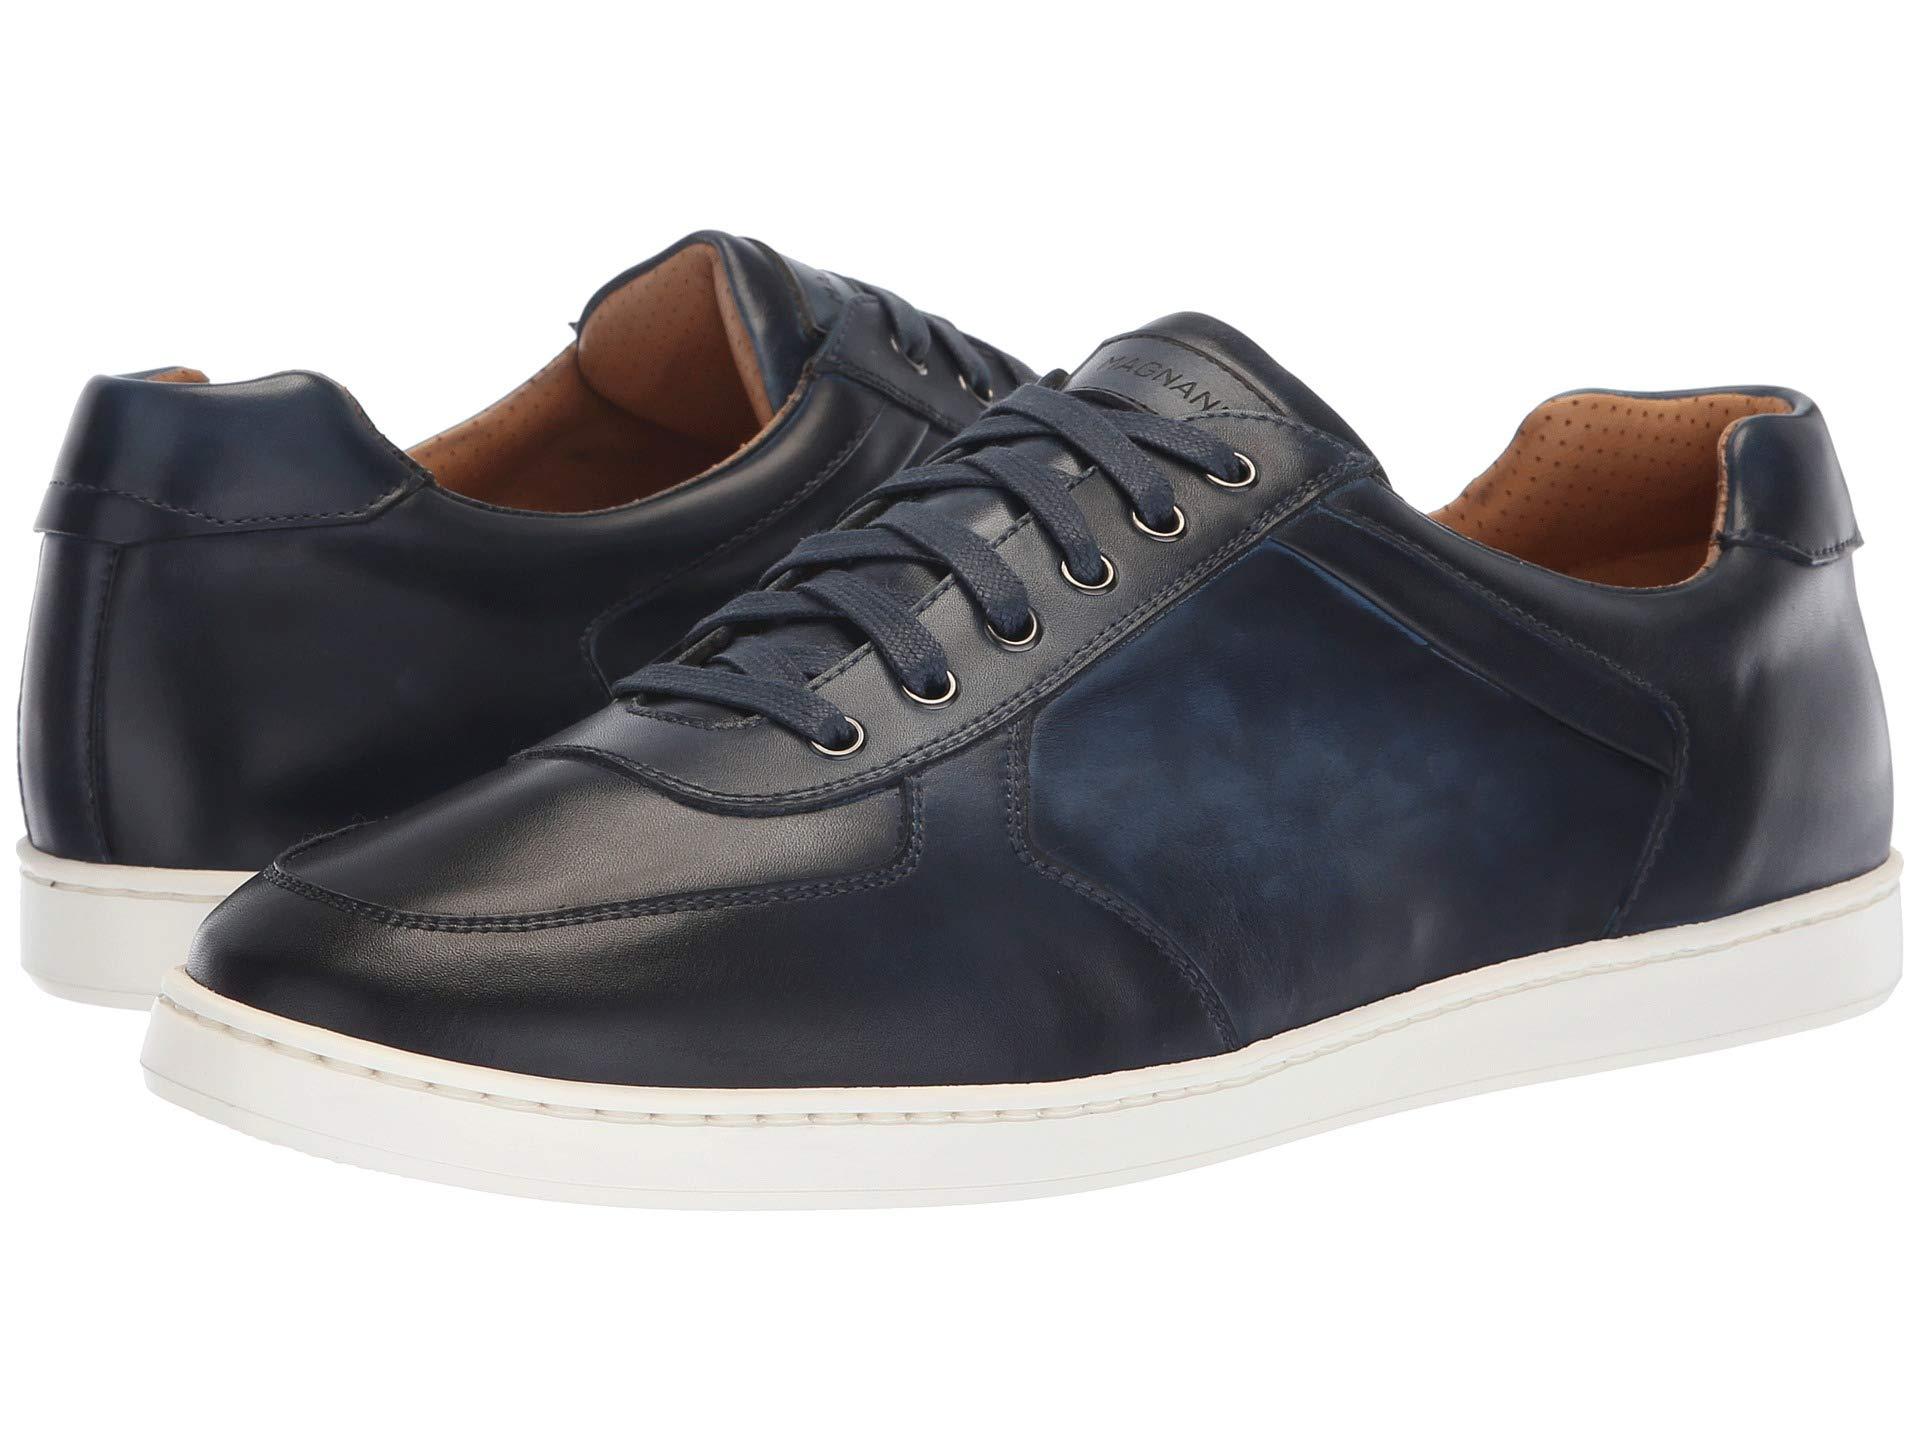 d8e83dbe7 Sneakers Shoes Navy Echo Lo Athletic amp  Magnanni wfRUqx